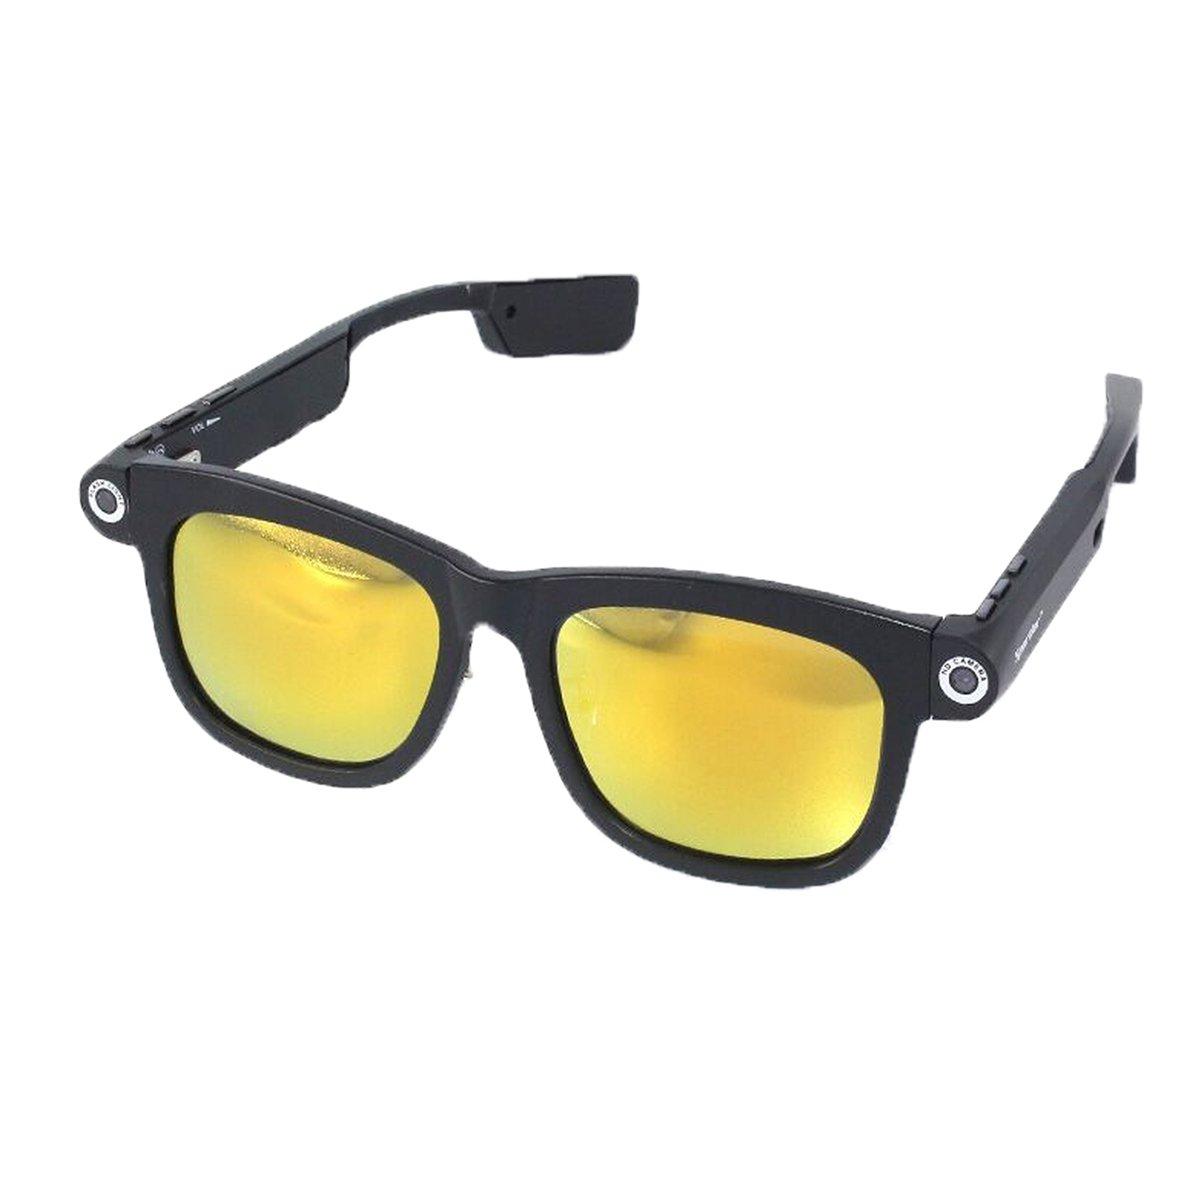 1280x720p CSR4.0 Bluetooth 32GB TFカード 内蔵 ビデオメガネネ サングラス UV400 偏光 サングラス (32G-Yellow) B078NZZ13G 32G-Yellow 32G-Yellow